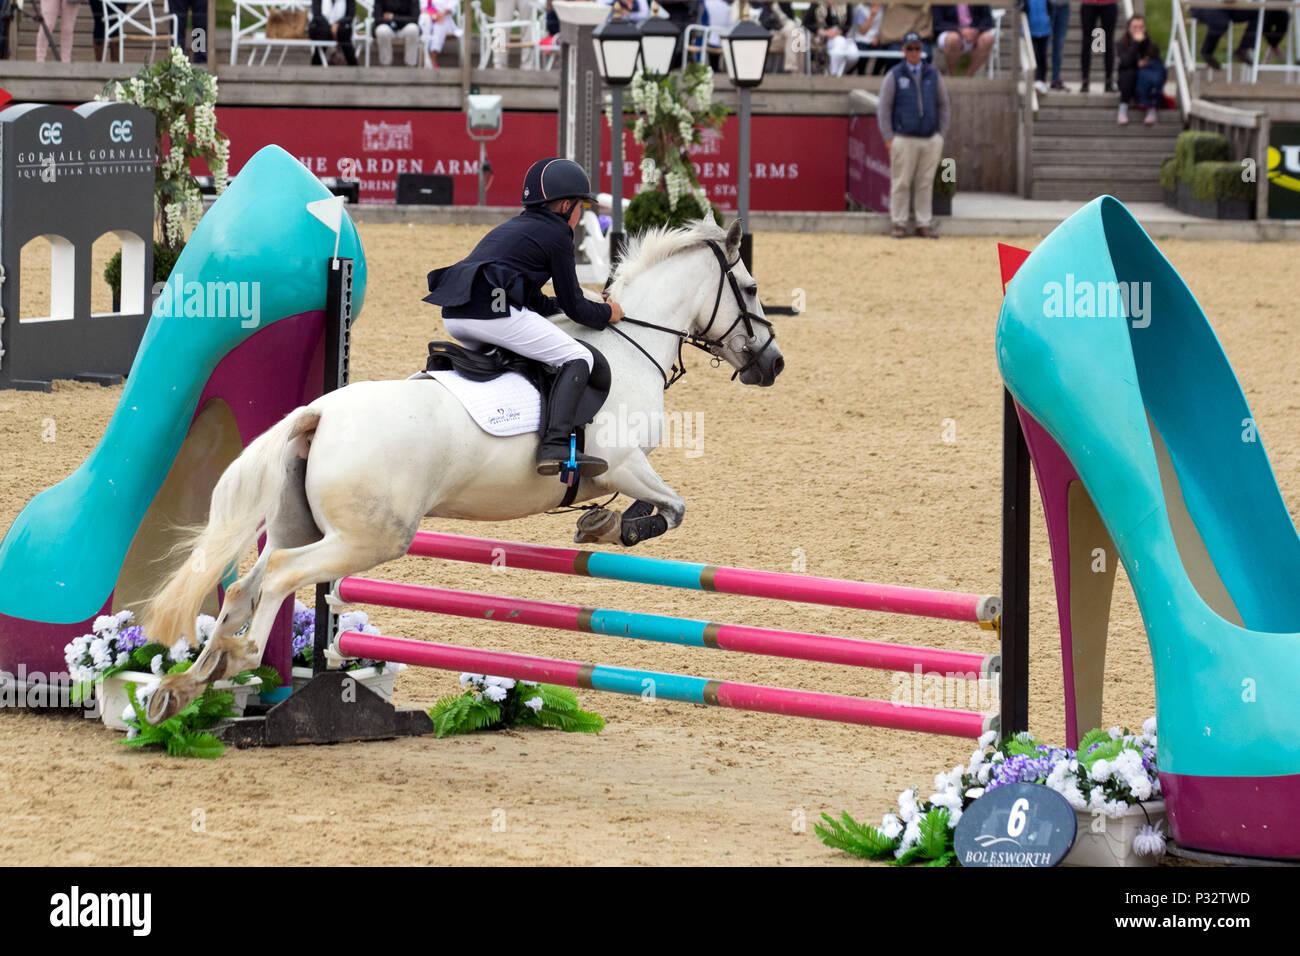 Jack Hewitt Bolesworth, Cheshire. 17/06/2018. Childens show jumping race in the Invitational Mini Major Relay. Horse, fence, equestrian, animal, sport, competition, jump, equine, rider, show, obstacle, hurdle, horseback, event, stallion, champion, jumping, jockey, riding, equitation, horseman. Credit MediaWorldImages/AlamyLiveNews. - Stock Image